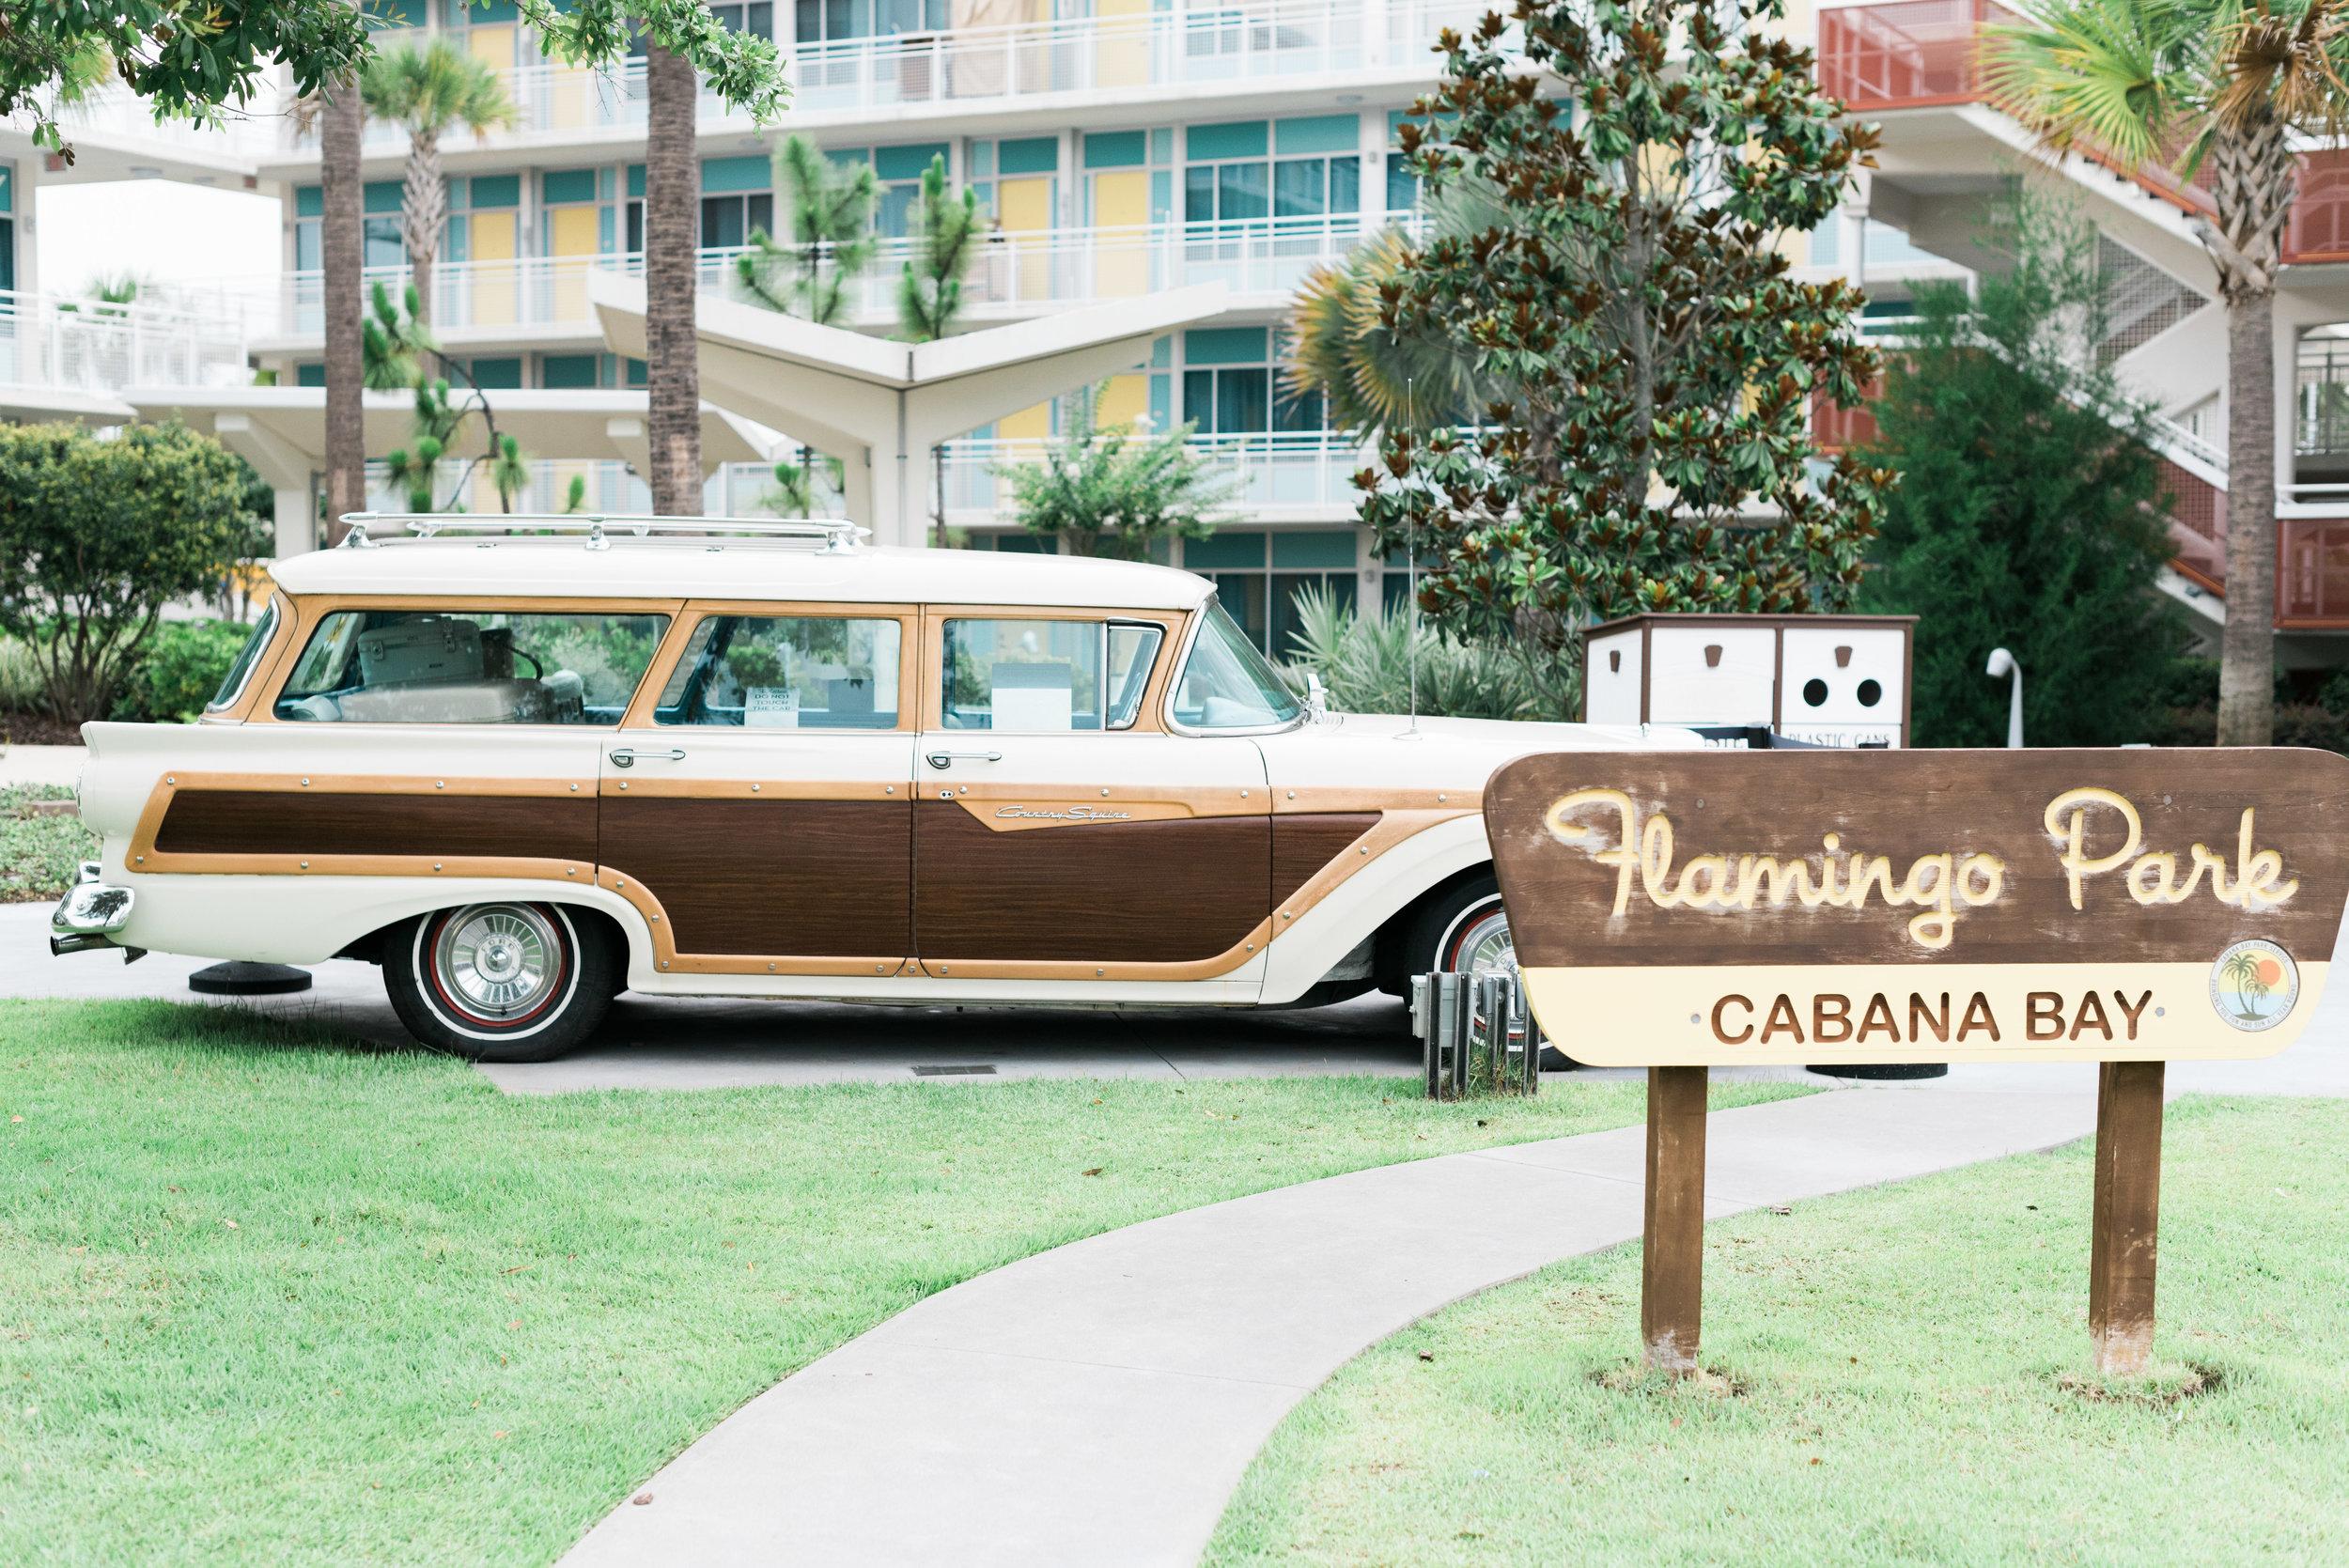 cabana bay beach resort orlando florida travel photographer